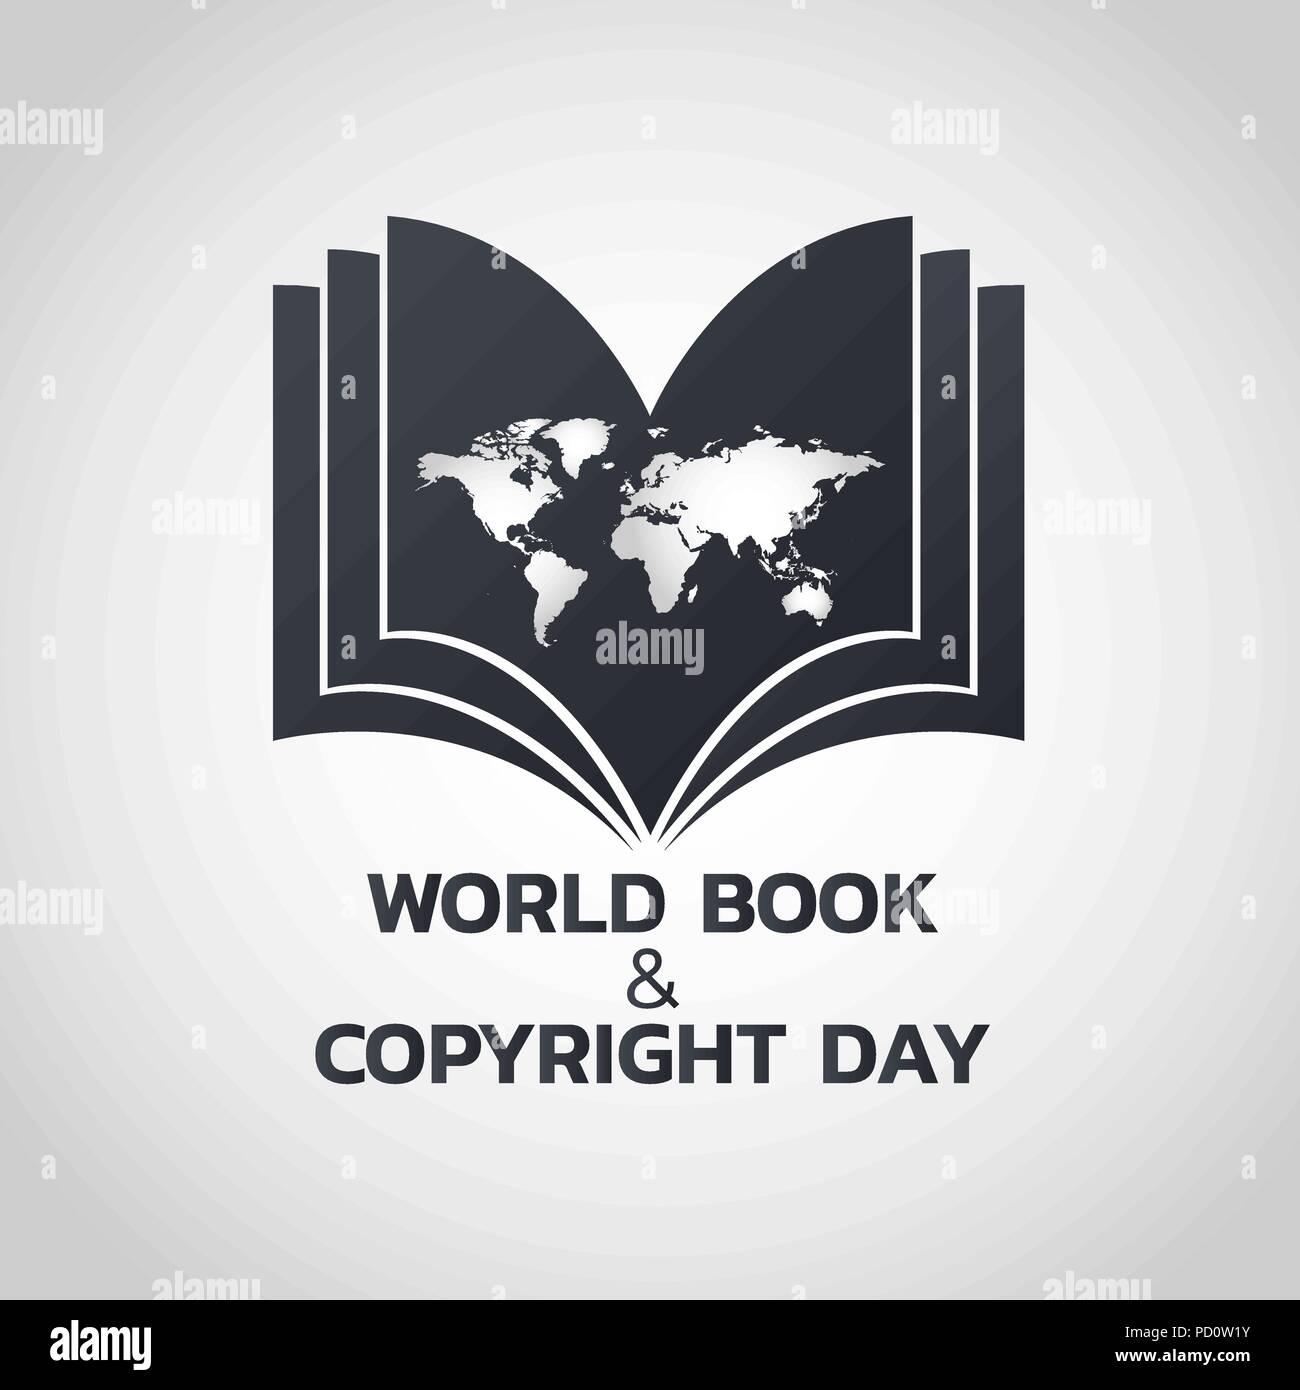 World Book and Copyright Day logo icon design, vector illustration - Stock Vector